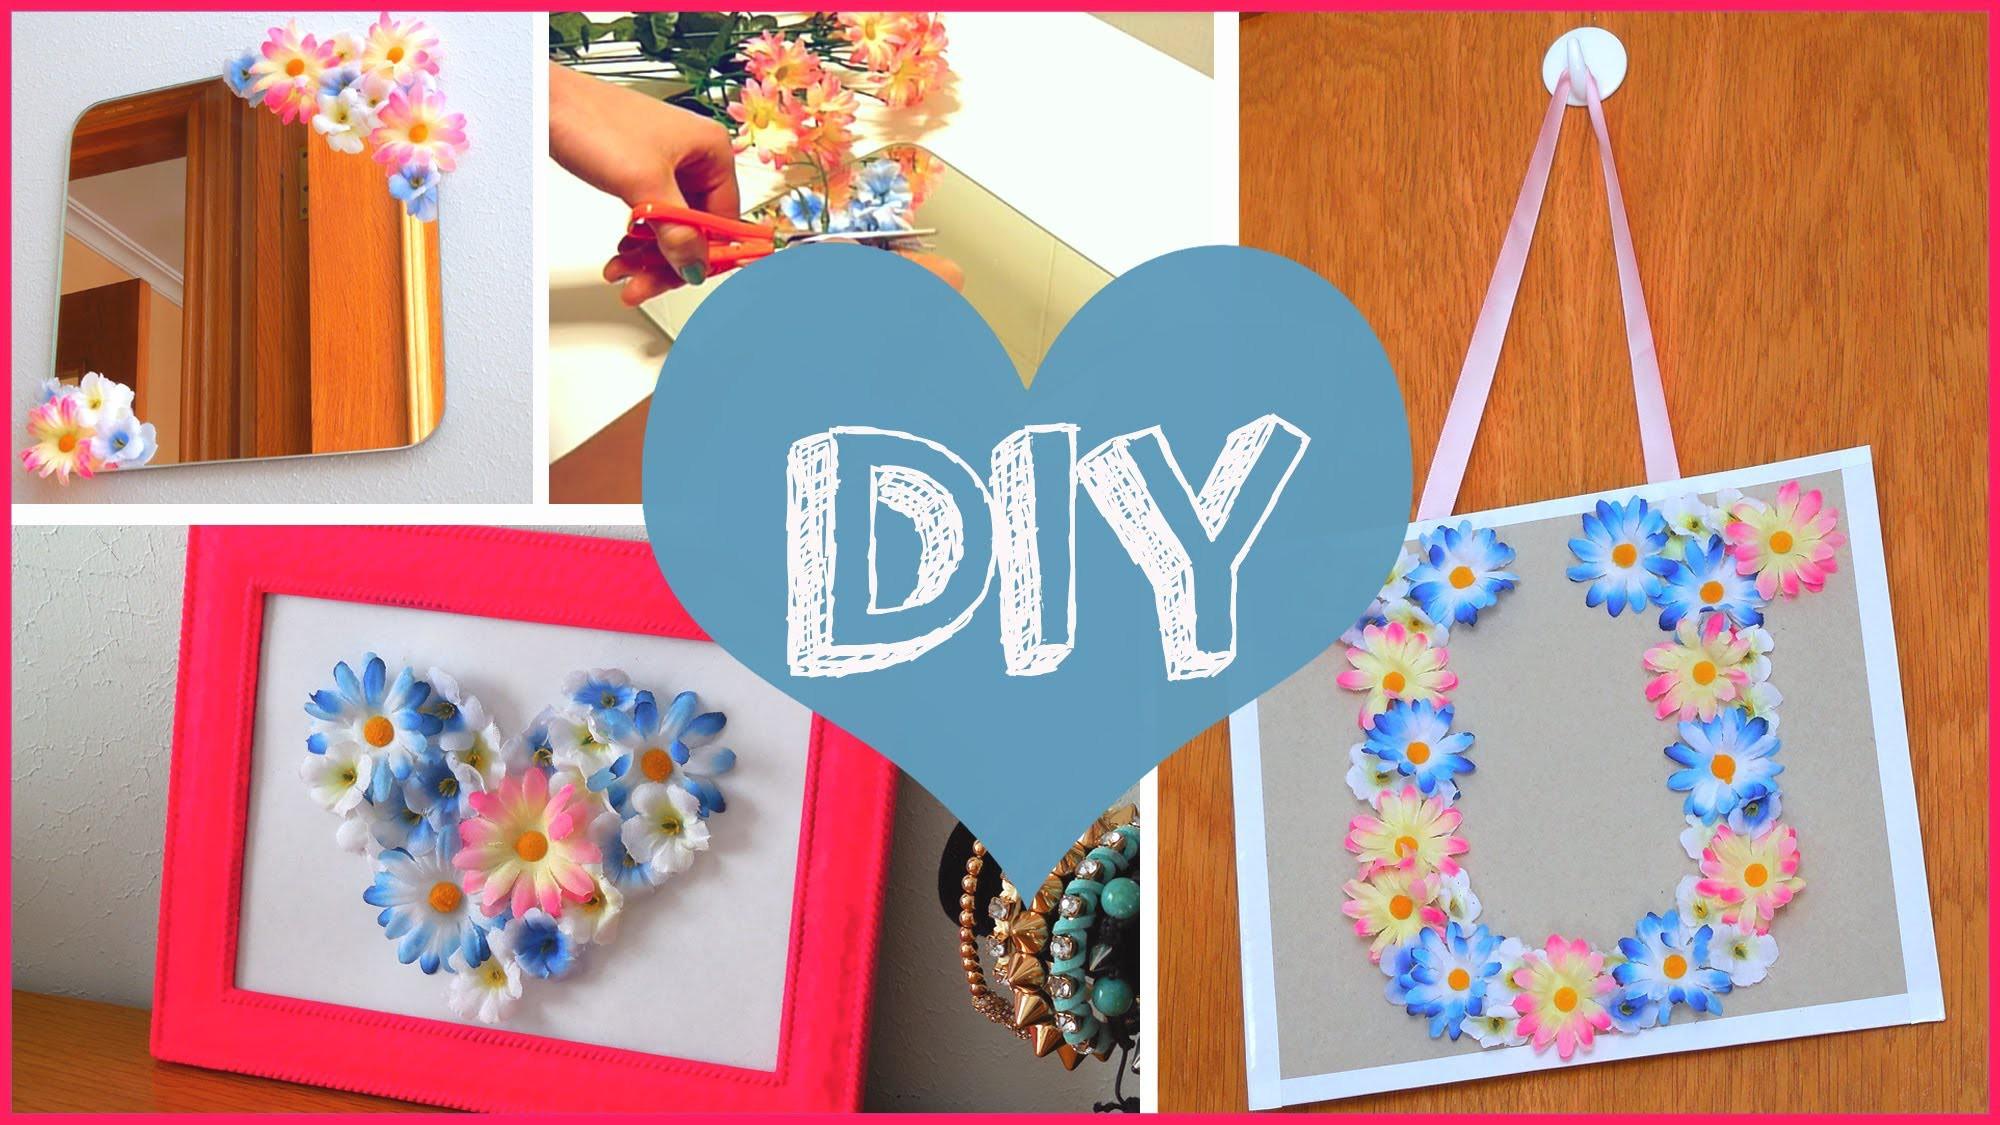 Cute Diy Home Decor Ideas: DIY ROOM DECOR Cheap & Cute Projects Using Fake Flowers